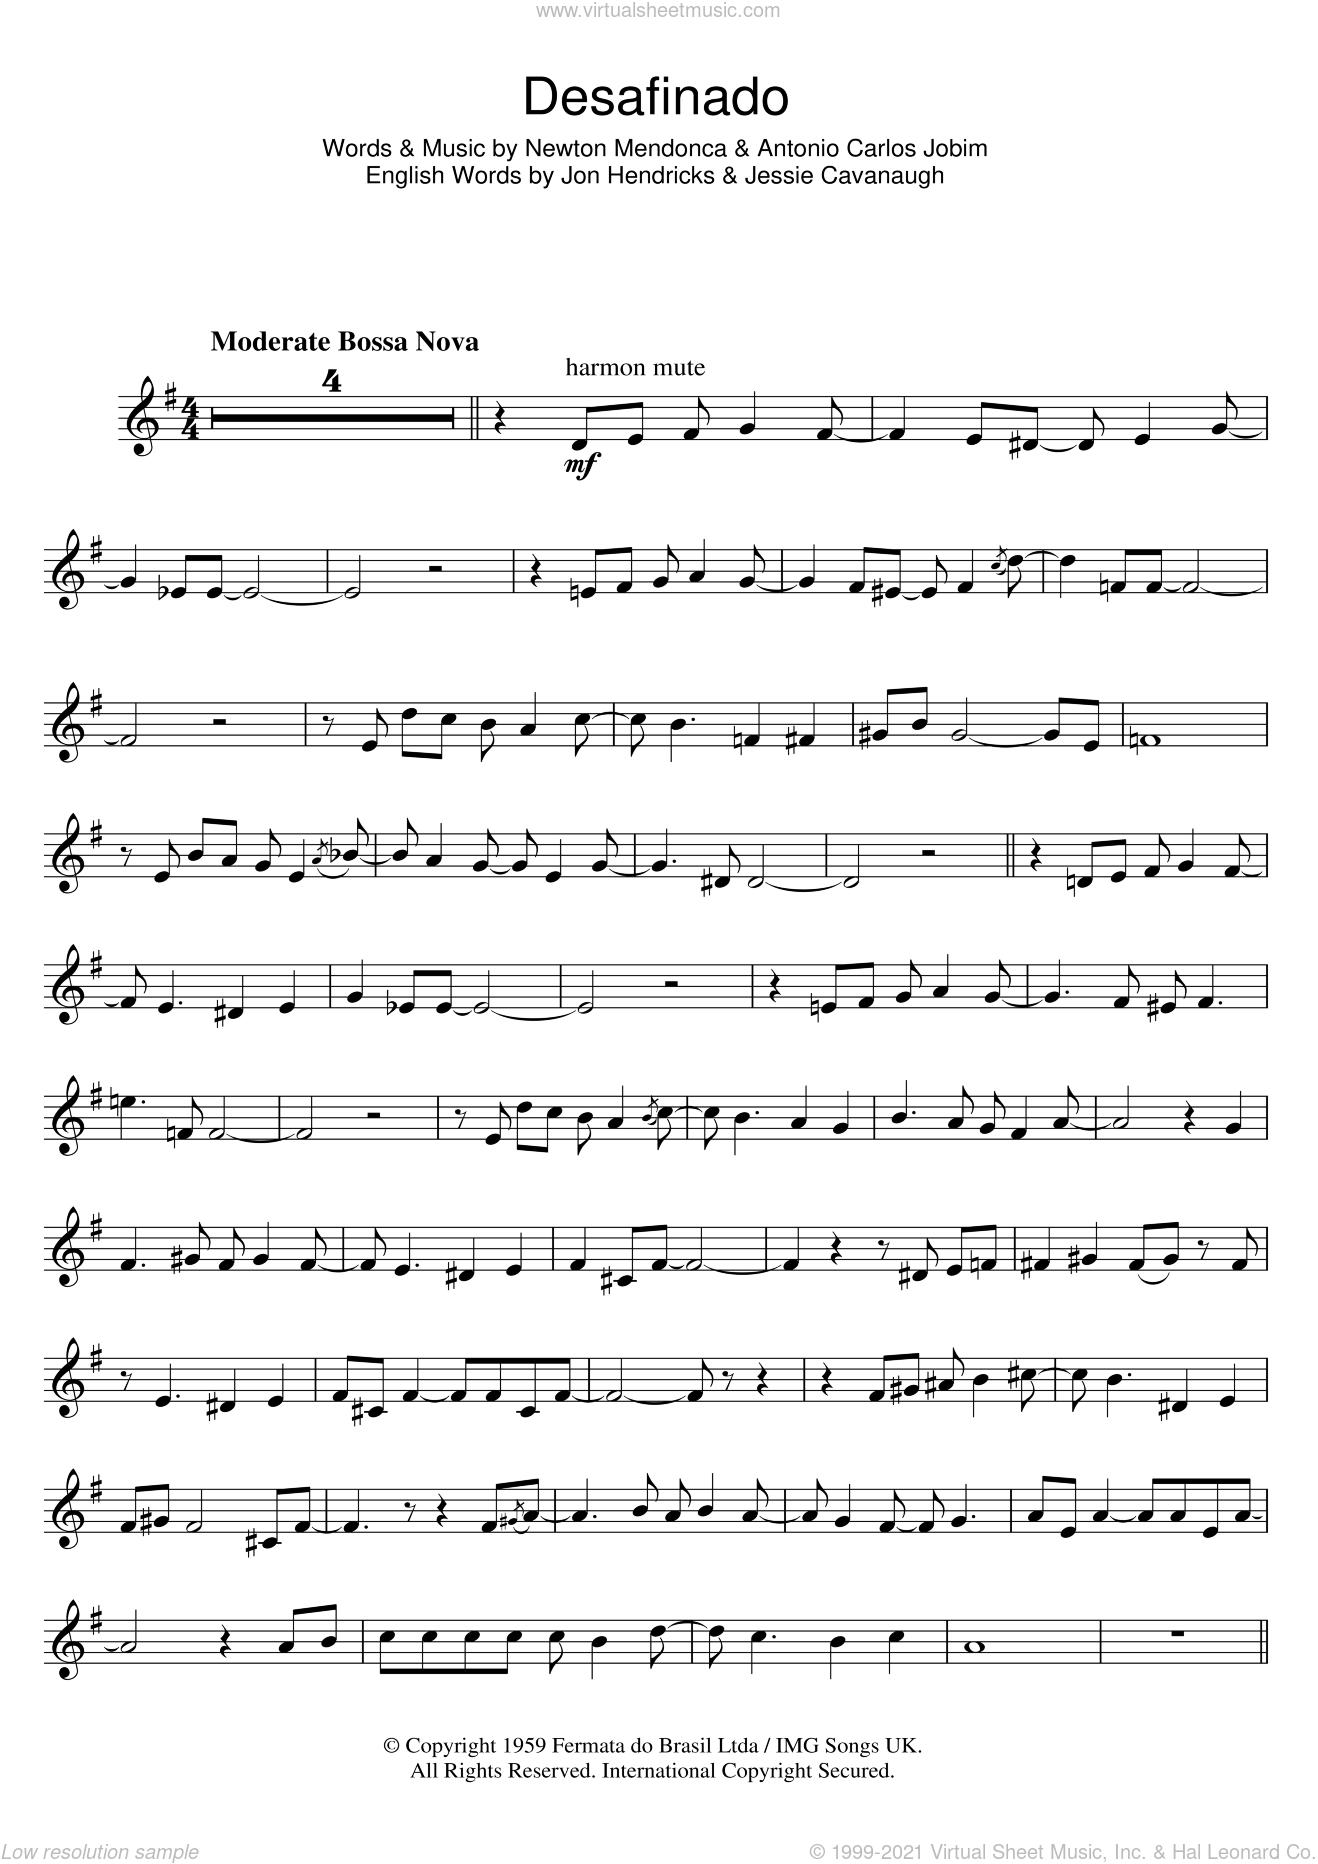 Desafinado (Slightly Out Of Tune) sheet music for trumpet solo by Antonio Carlos Jobim, Jessie Cavanaugh, Jon Hendricks and Newton Mendonca, intermediate skill level